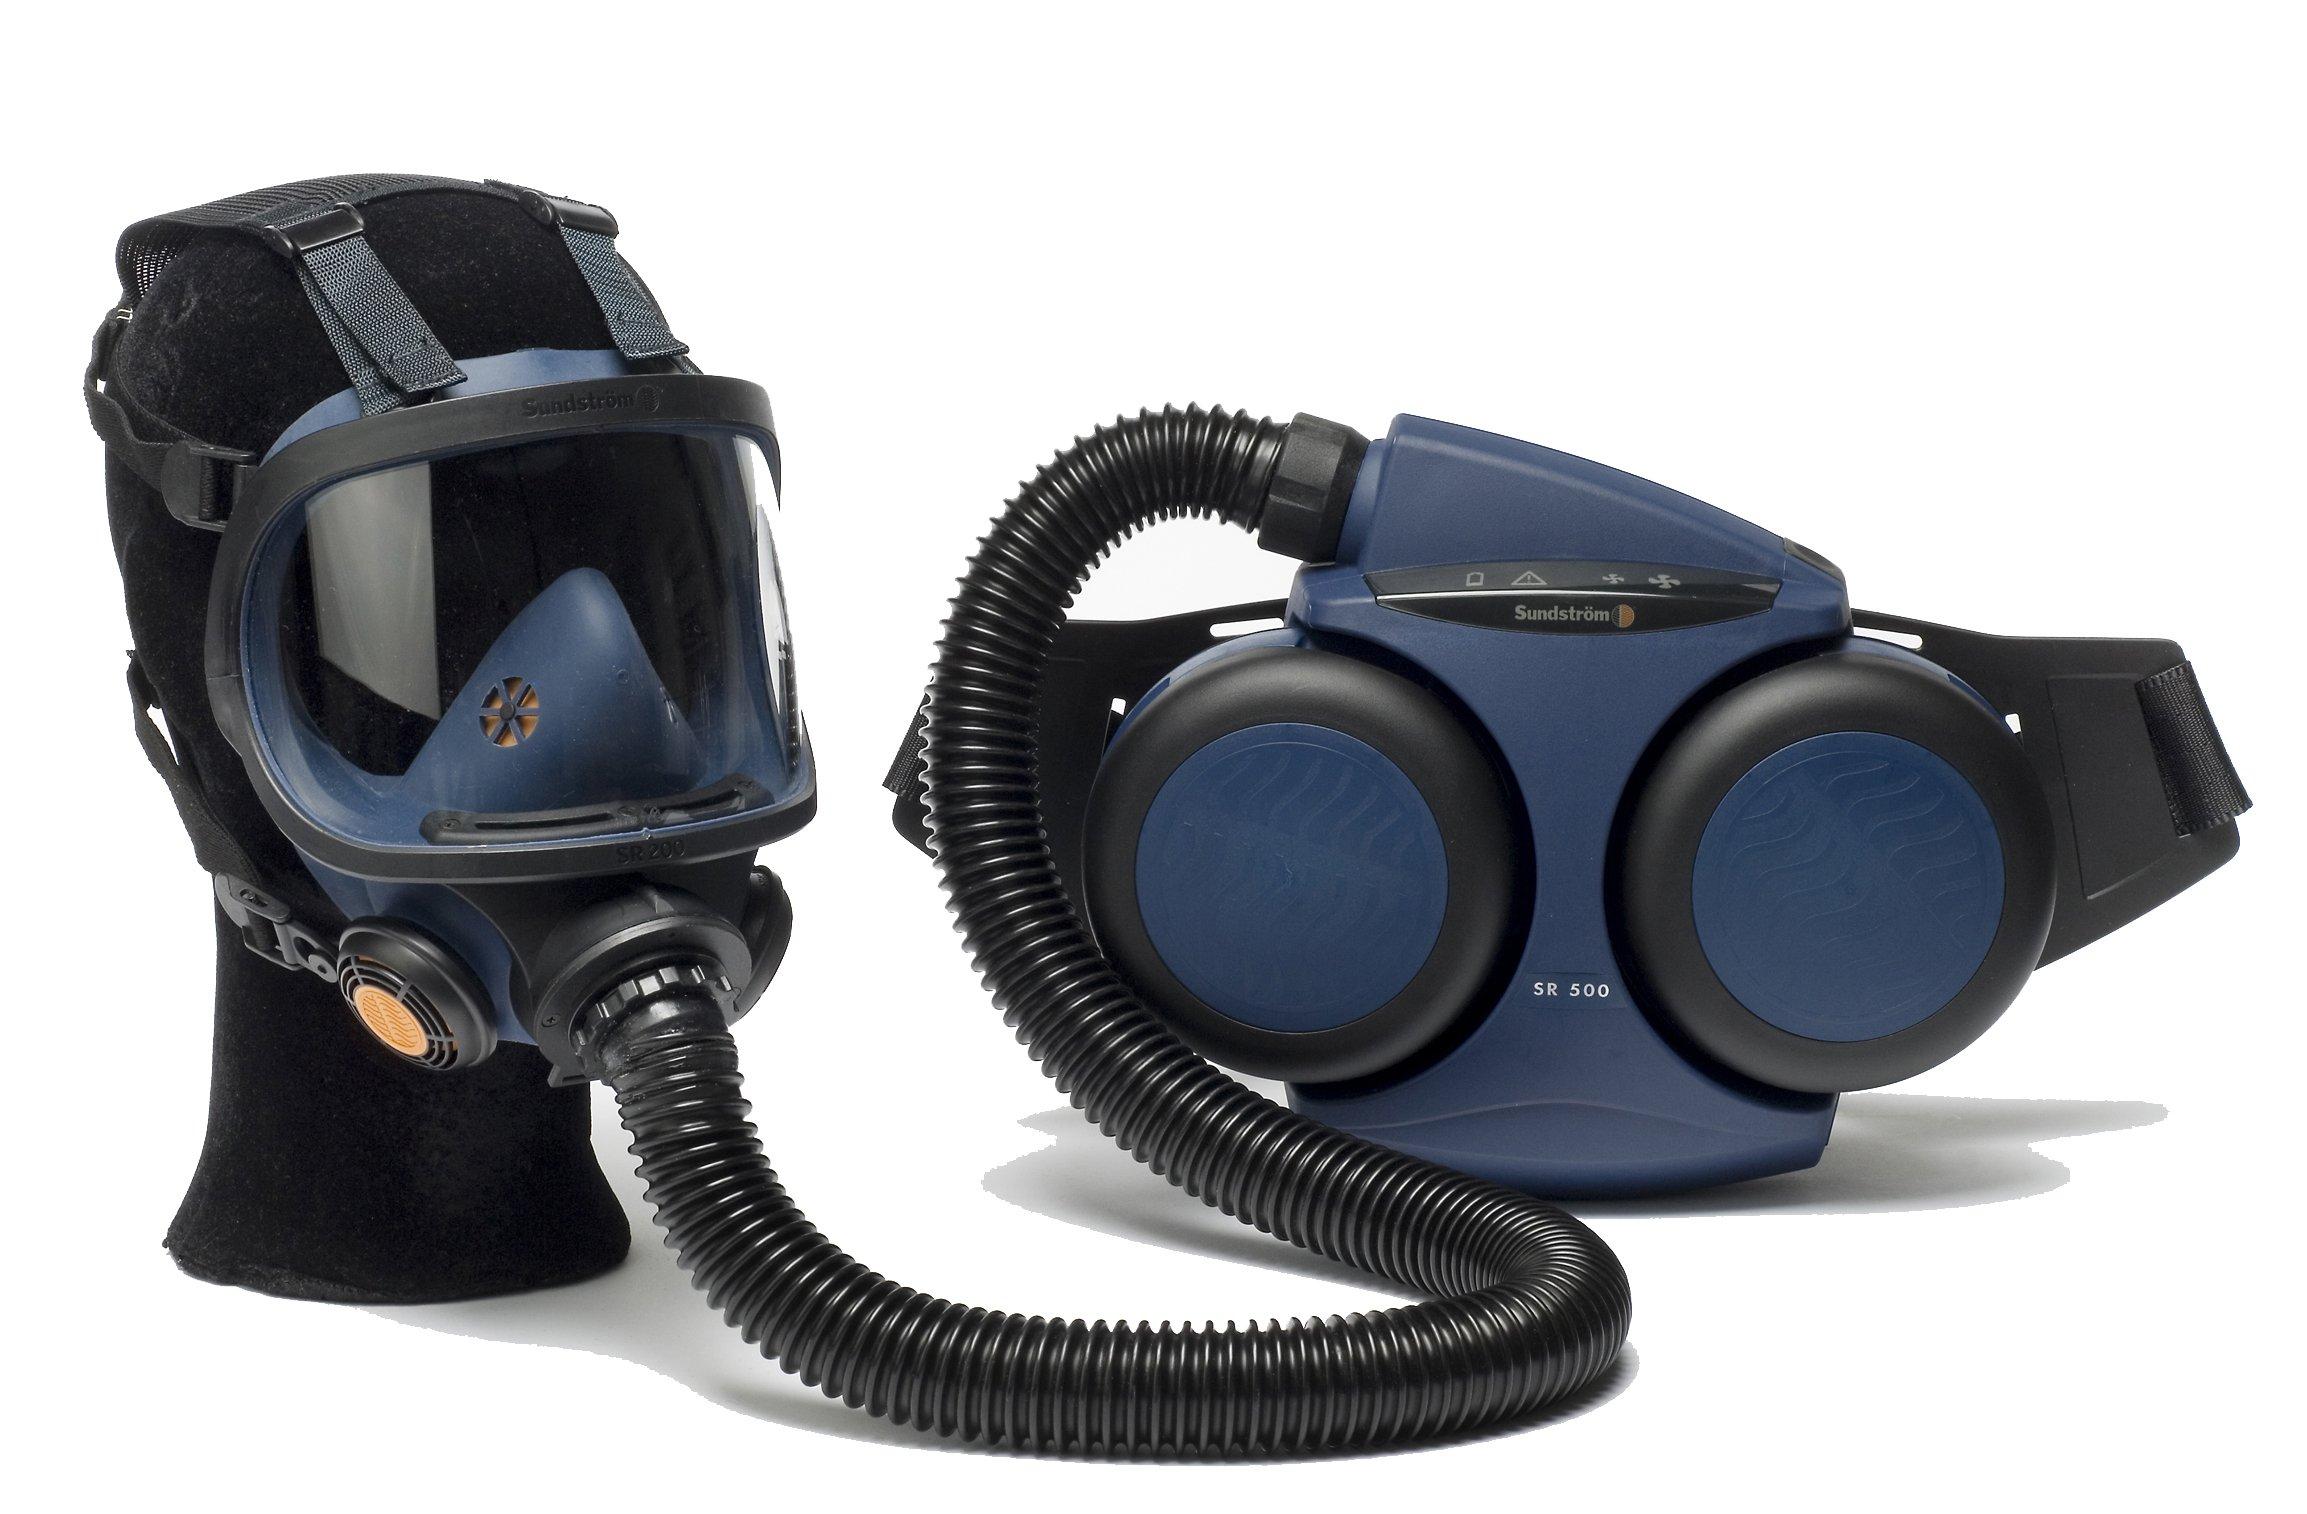 Sundström SR 500/200 PAPR Kit, Includes SR 500 Fan Unit and SR 200 Full Face Mask, One Size, Blue